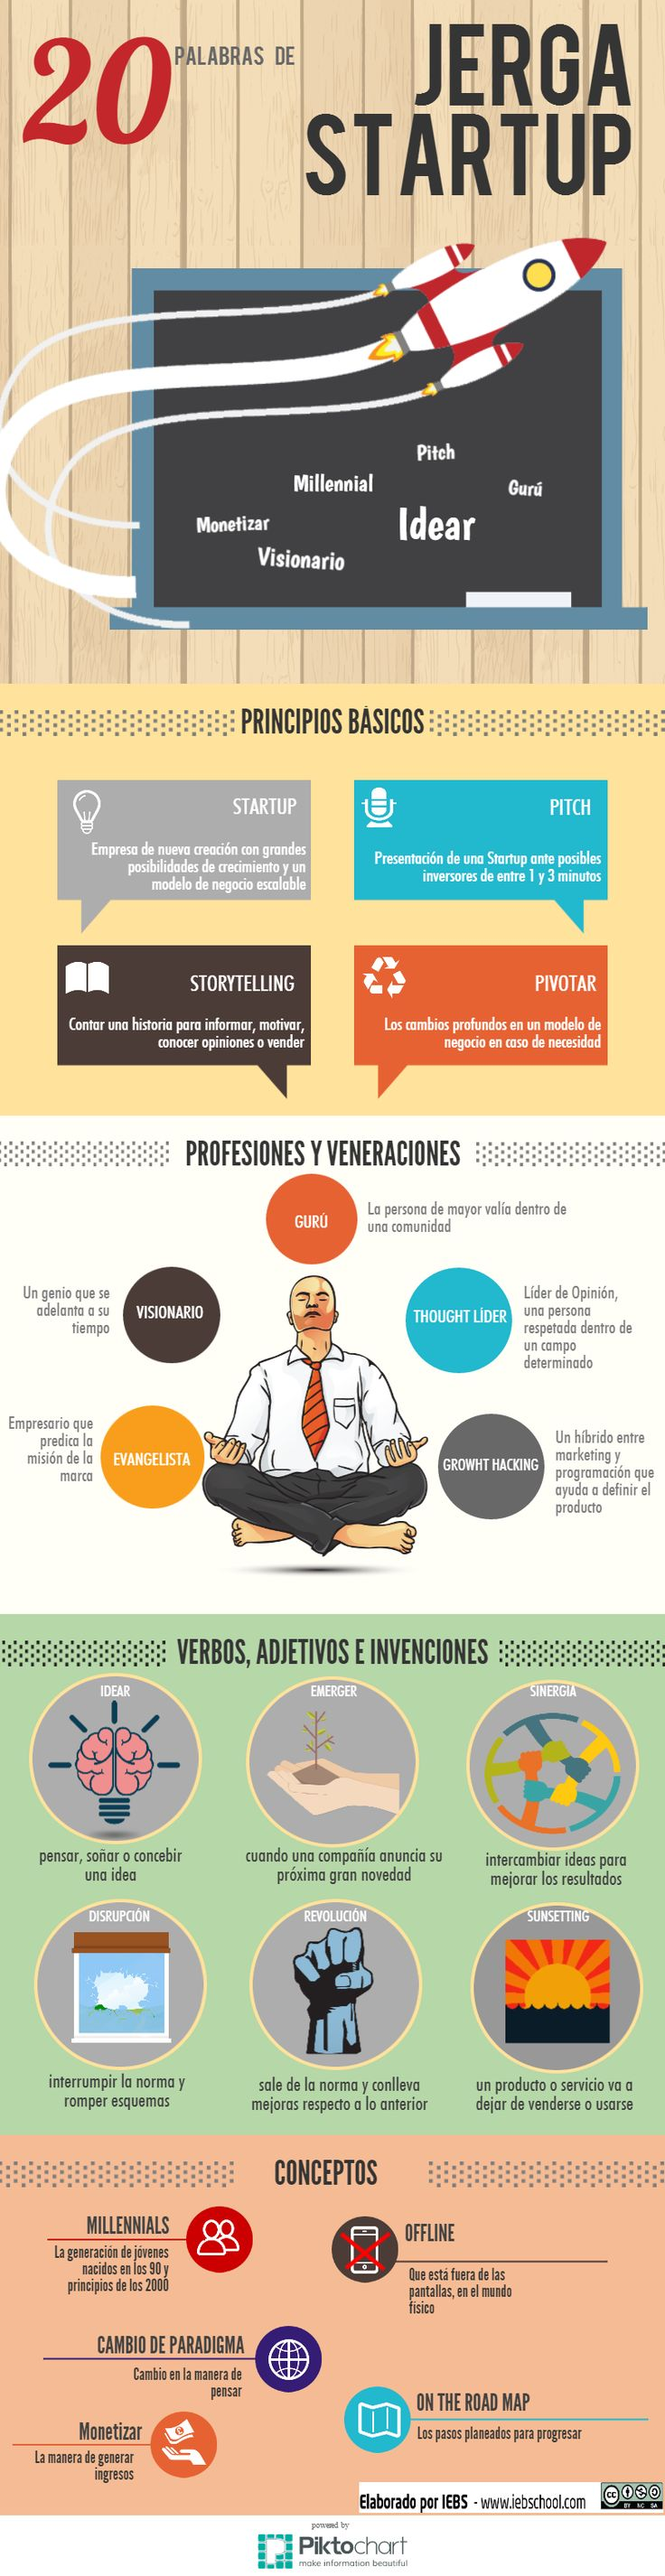 20 términos de la jerga Startup #infografia #infographic #entrepreneurship